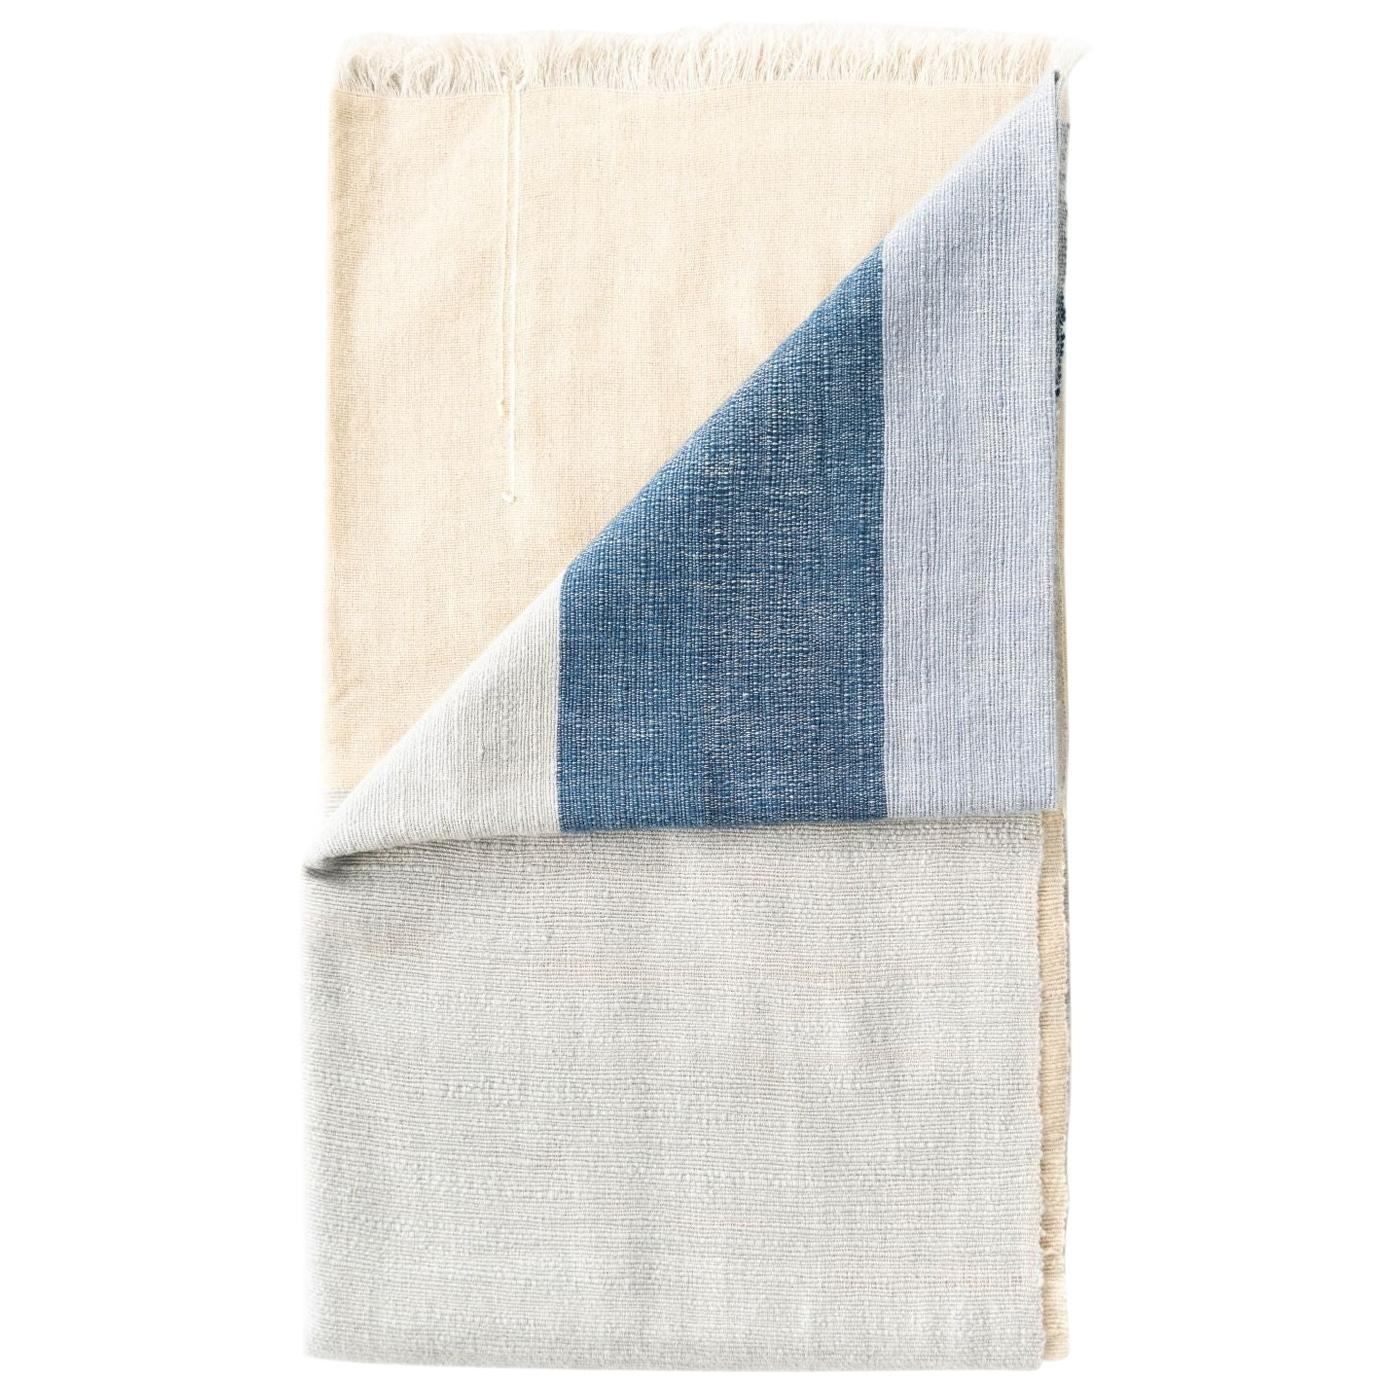 CERU Handloom Merino Throw / Blanket in Neutral Shades of Cream &  Blue